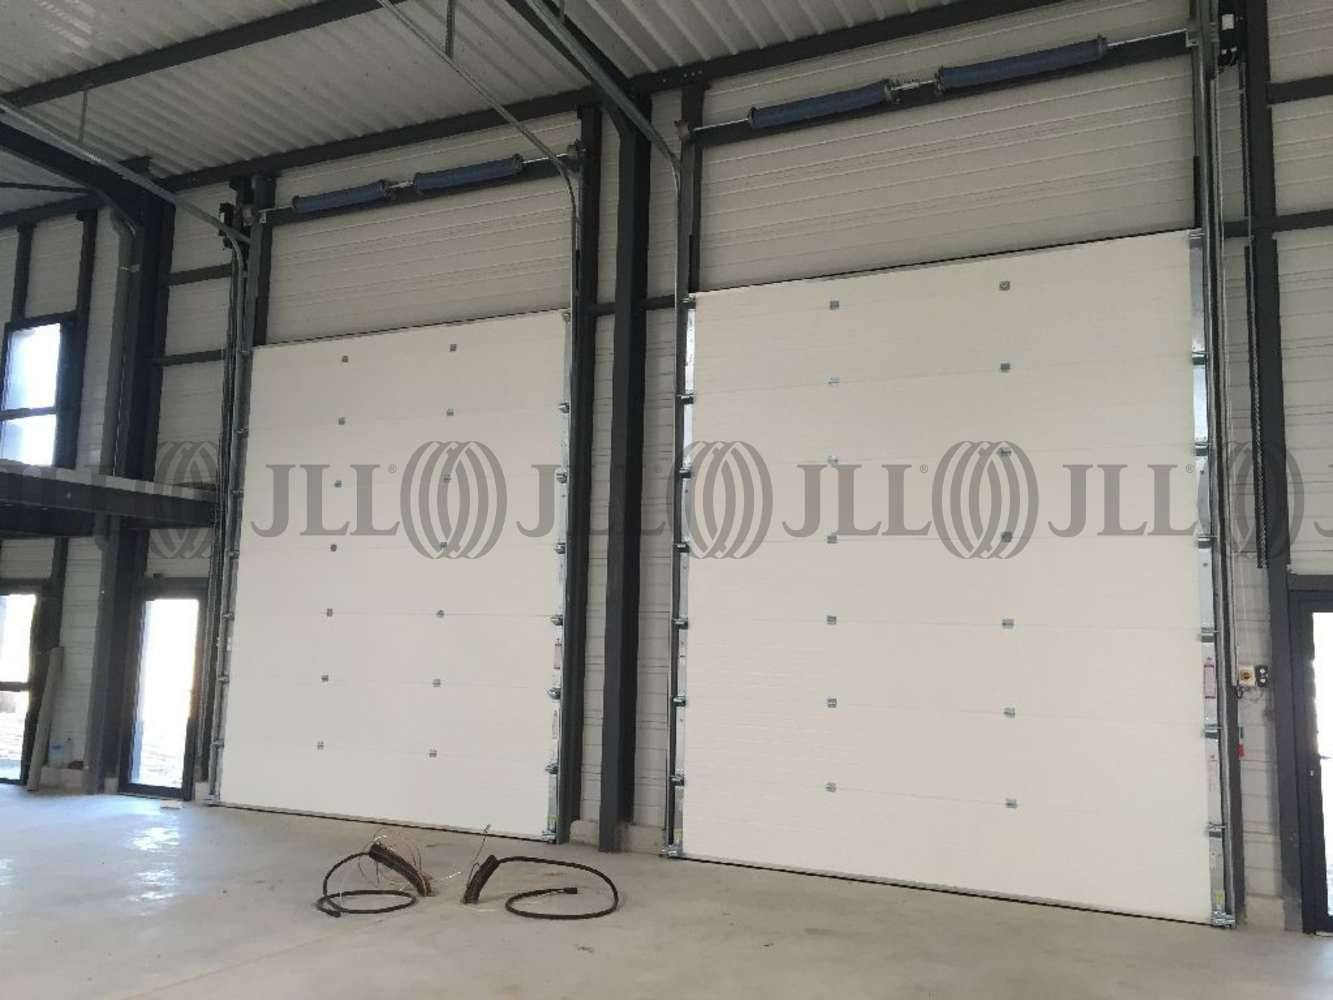 Activités/entrepôt Corbas, 69960 - LOCATION ENTREPOT CORBAS (LYON SUD, 69)